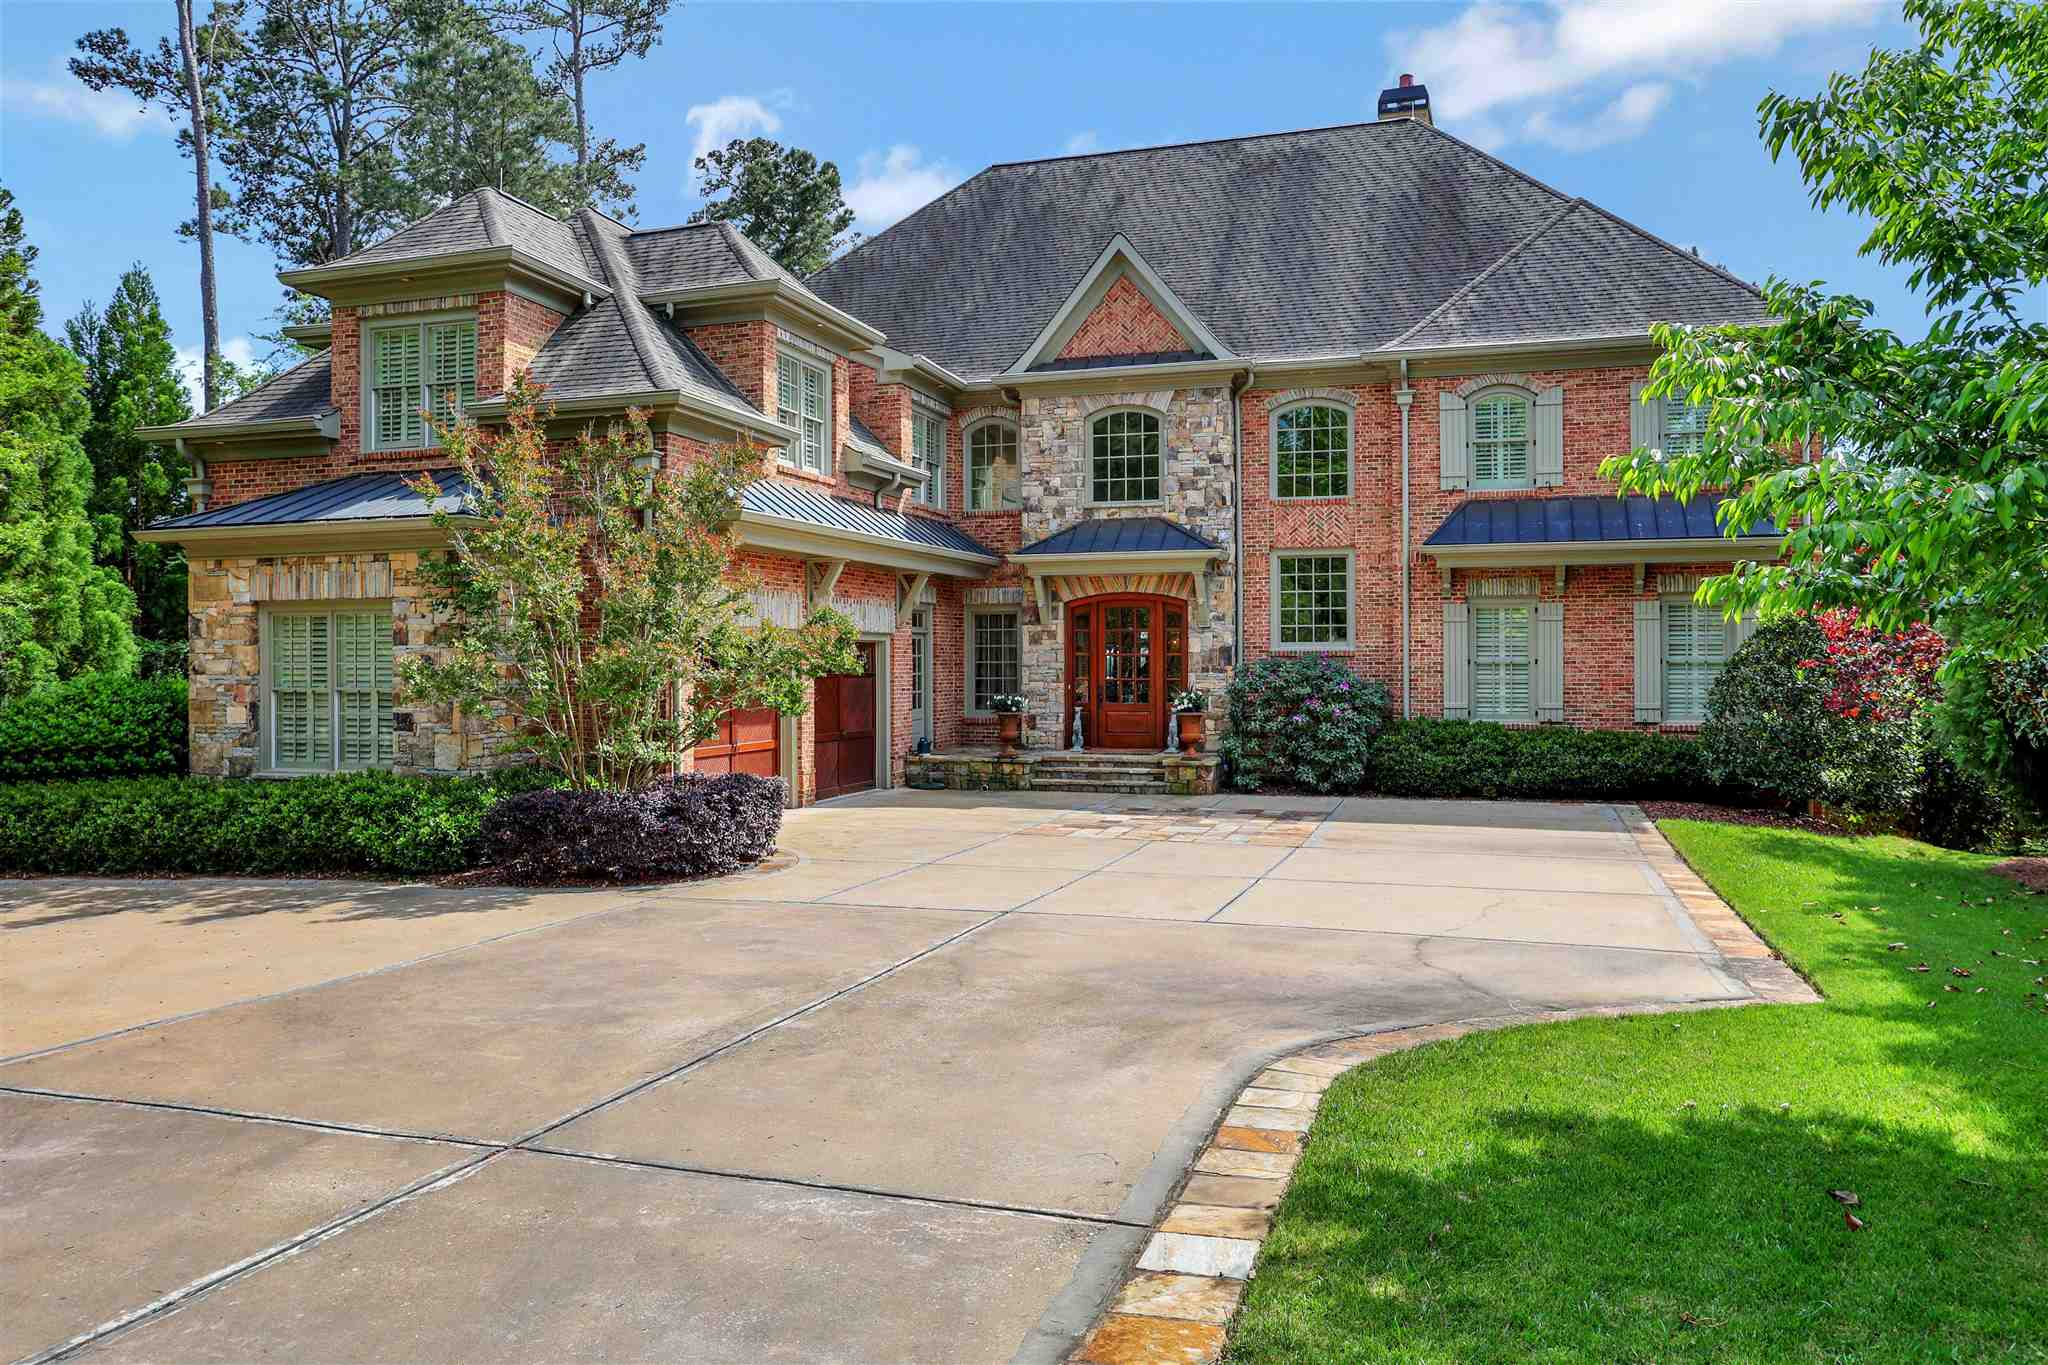 Property for sale at 2030 HIXONS BLUFF, Greensboro,  Georgia 30642